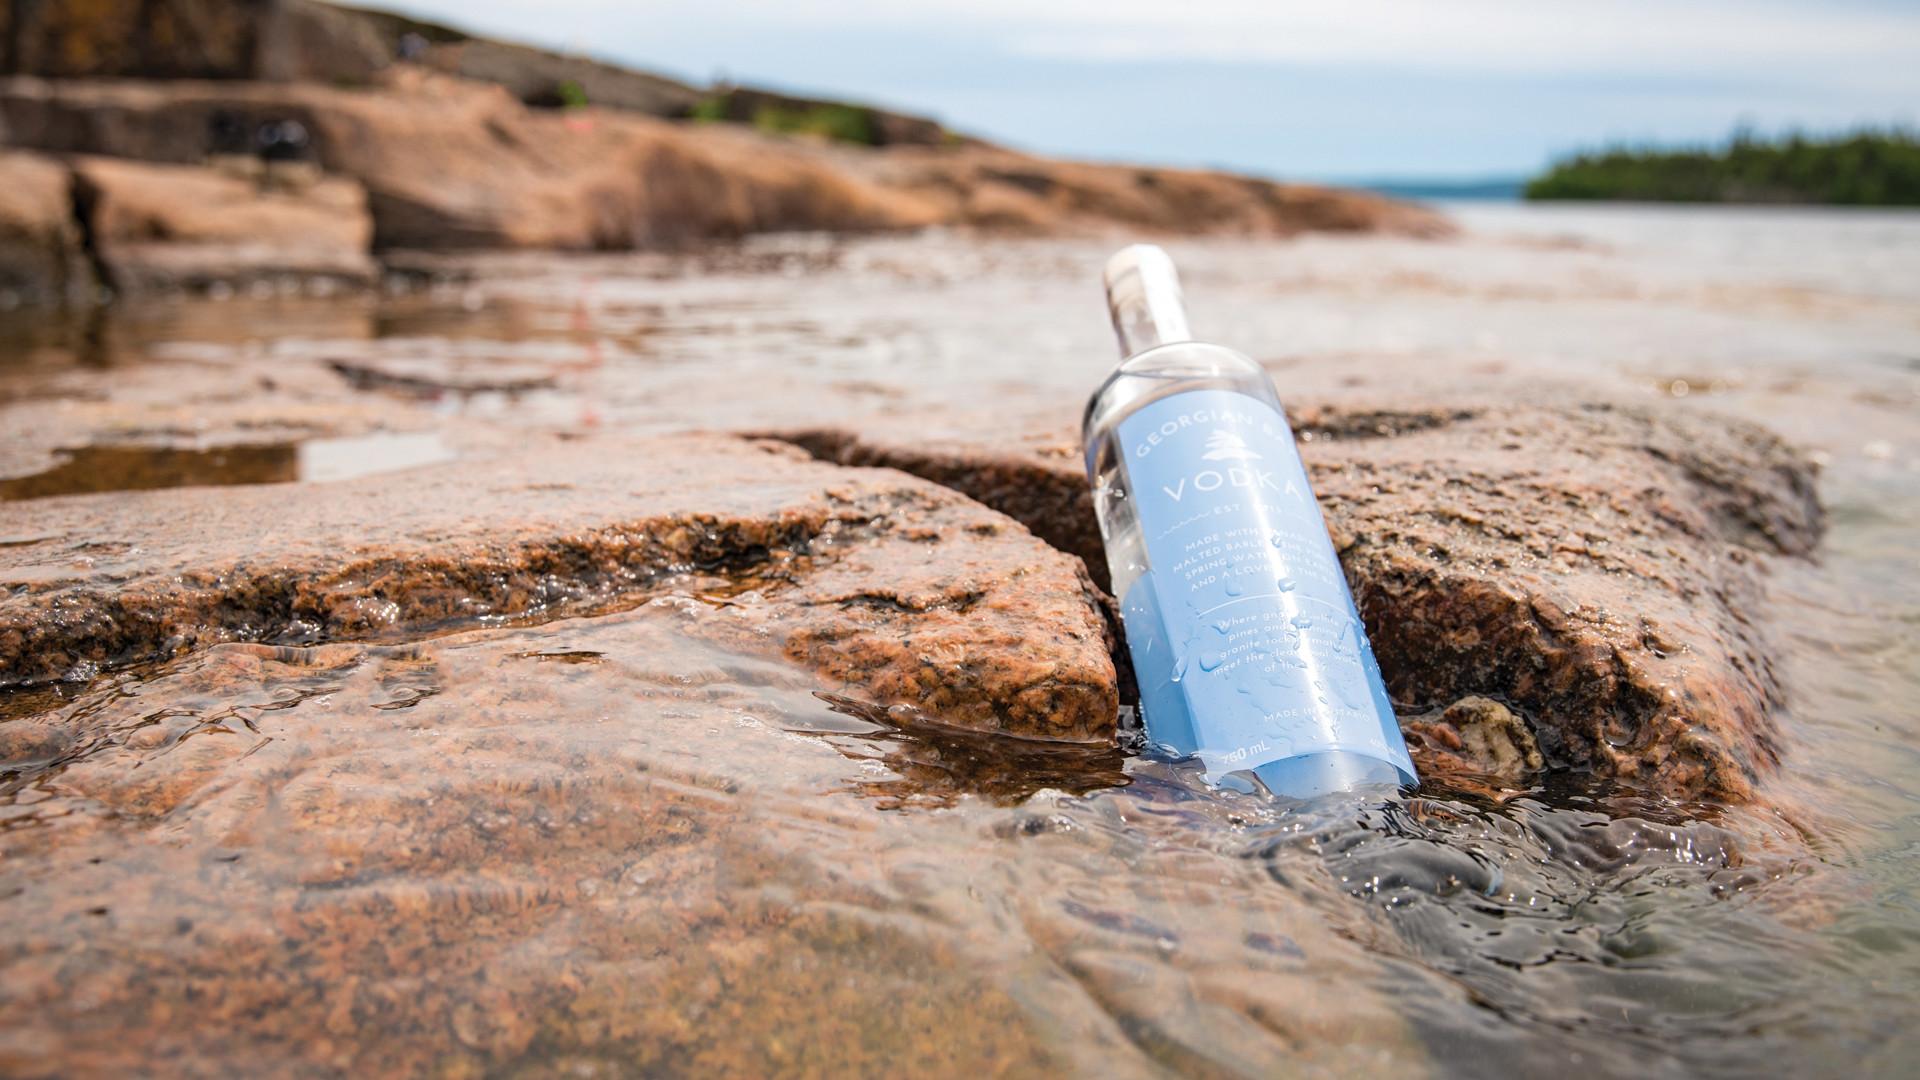 Win a smashing party pack from Georgian Bay Spirit Co. | Georgian Bay Vodka